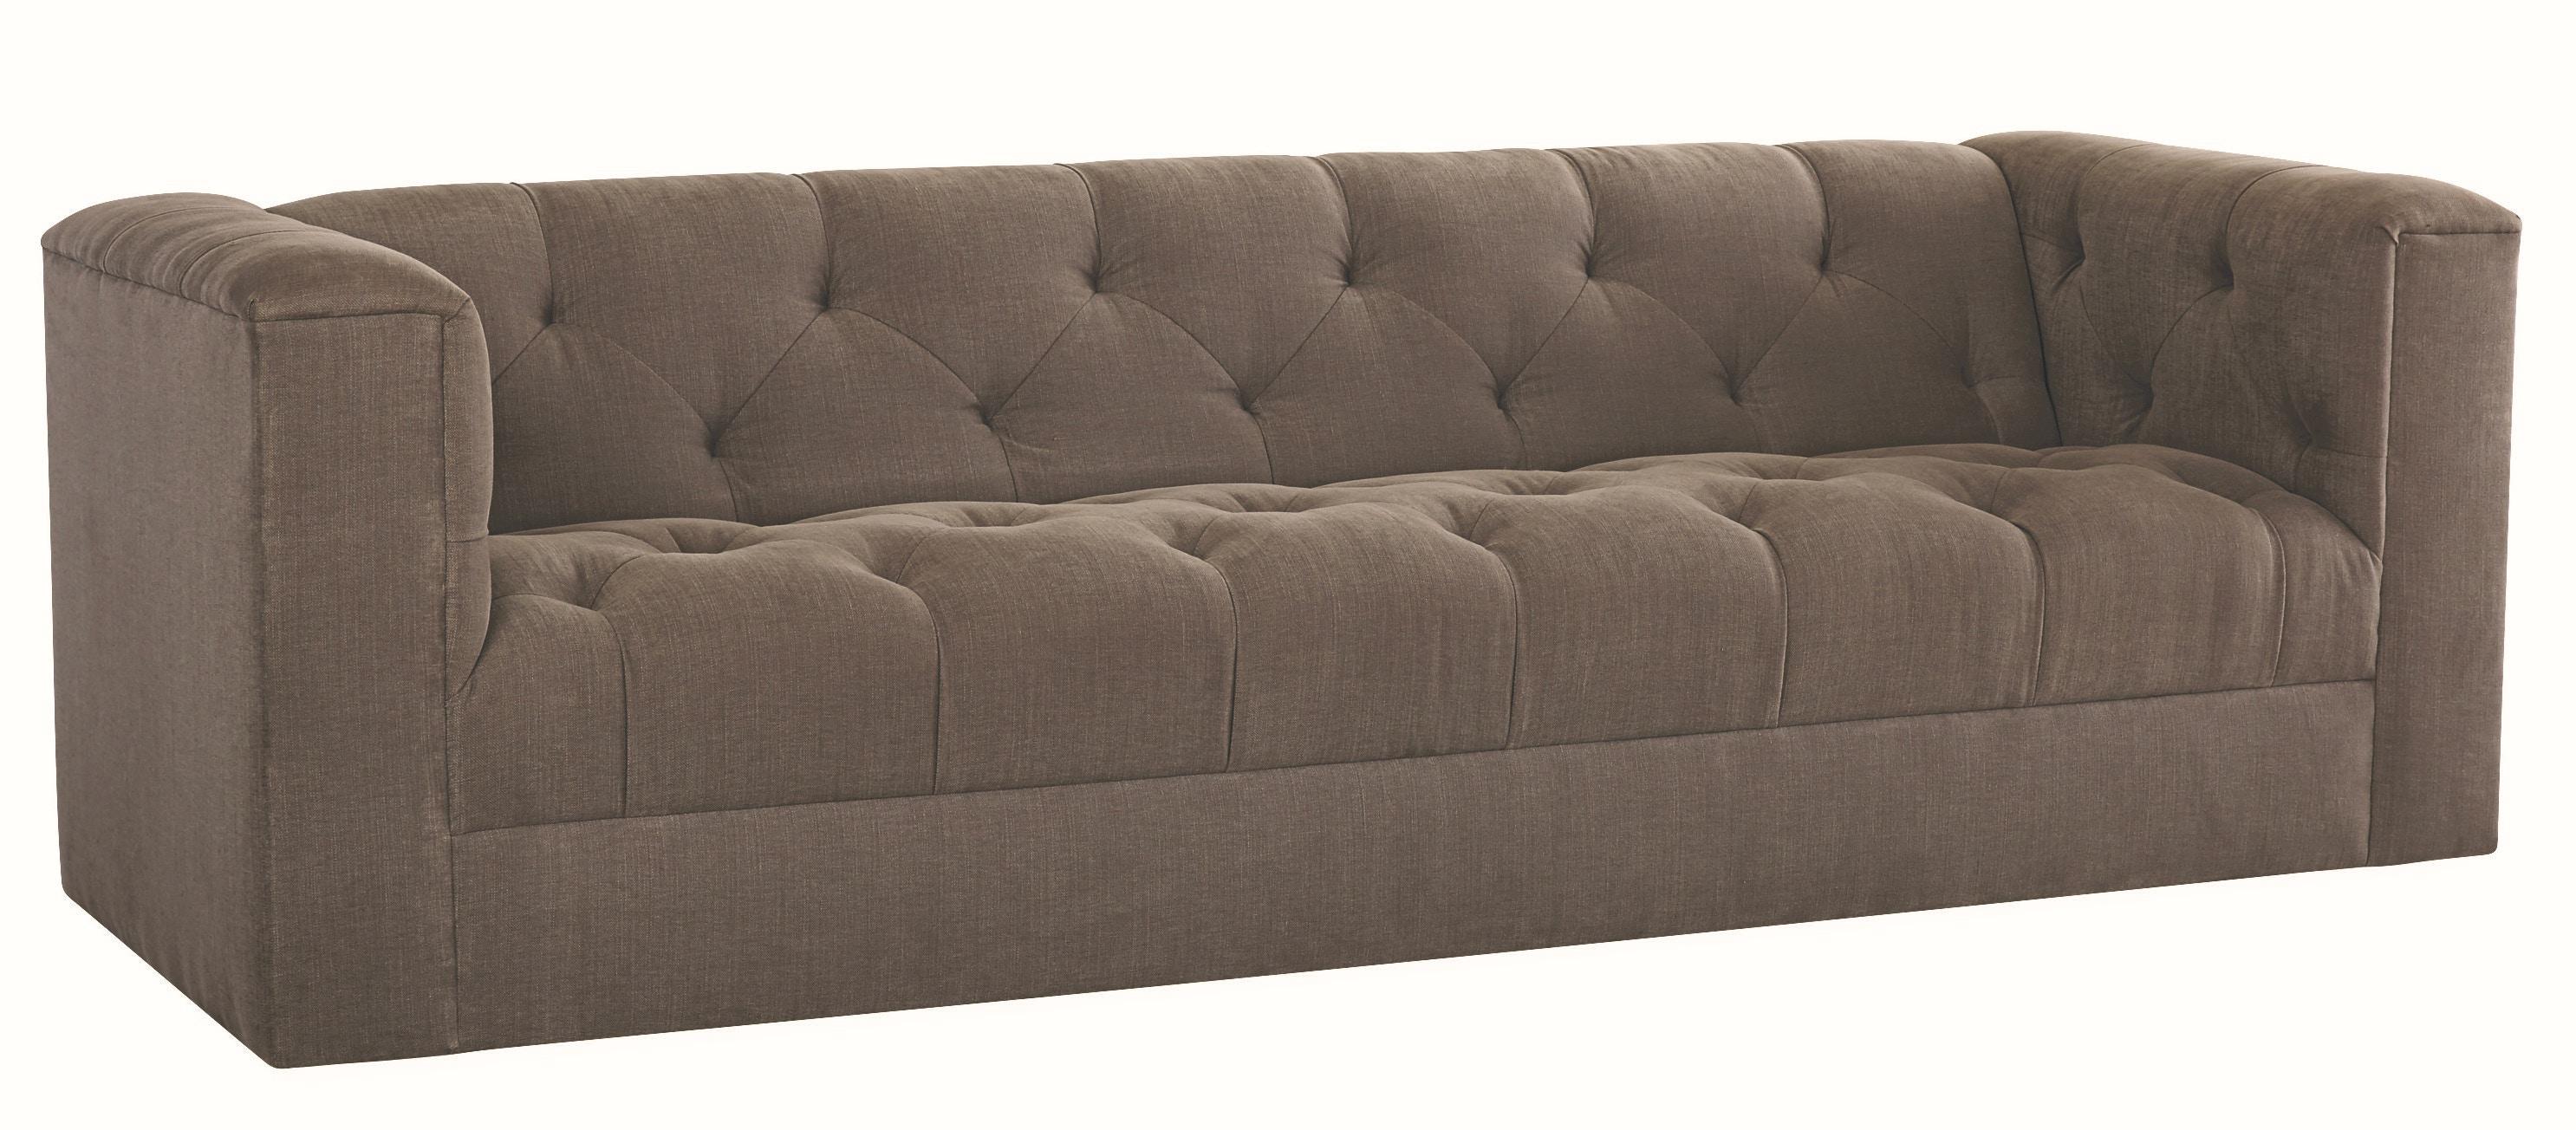 Fullsize Of Lee Industries Sofa